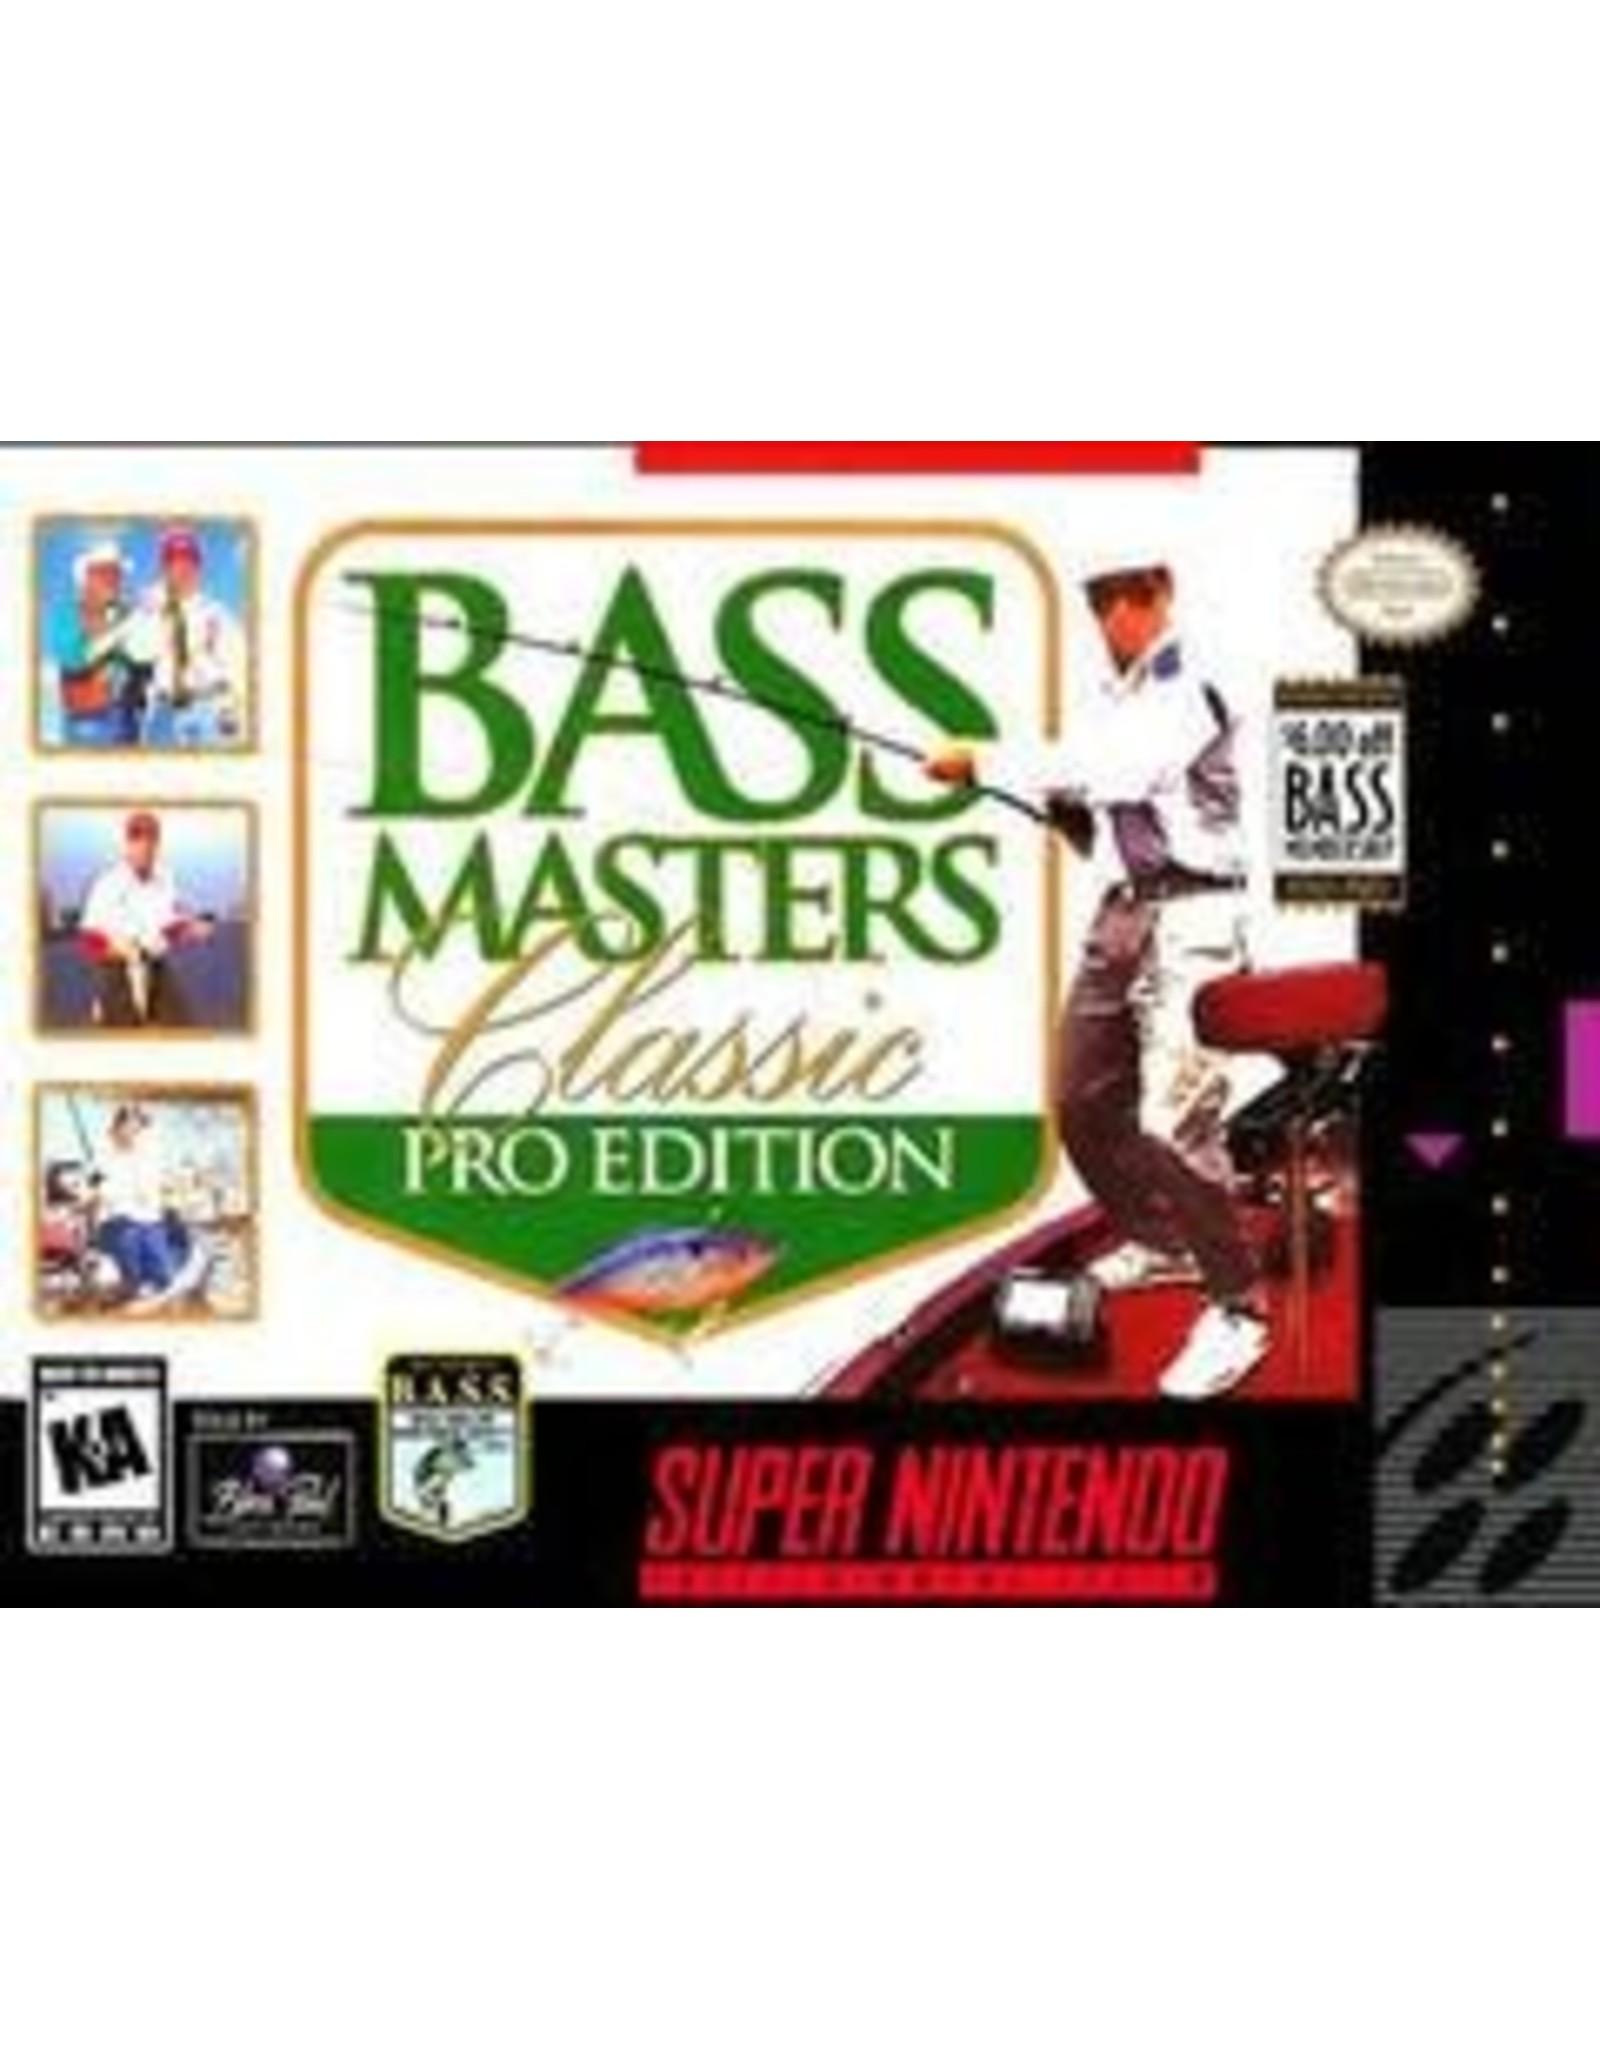 Super Nintendo Bass Masters Classic Pro Edition (Boxed No Manual)